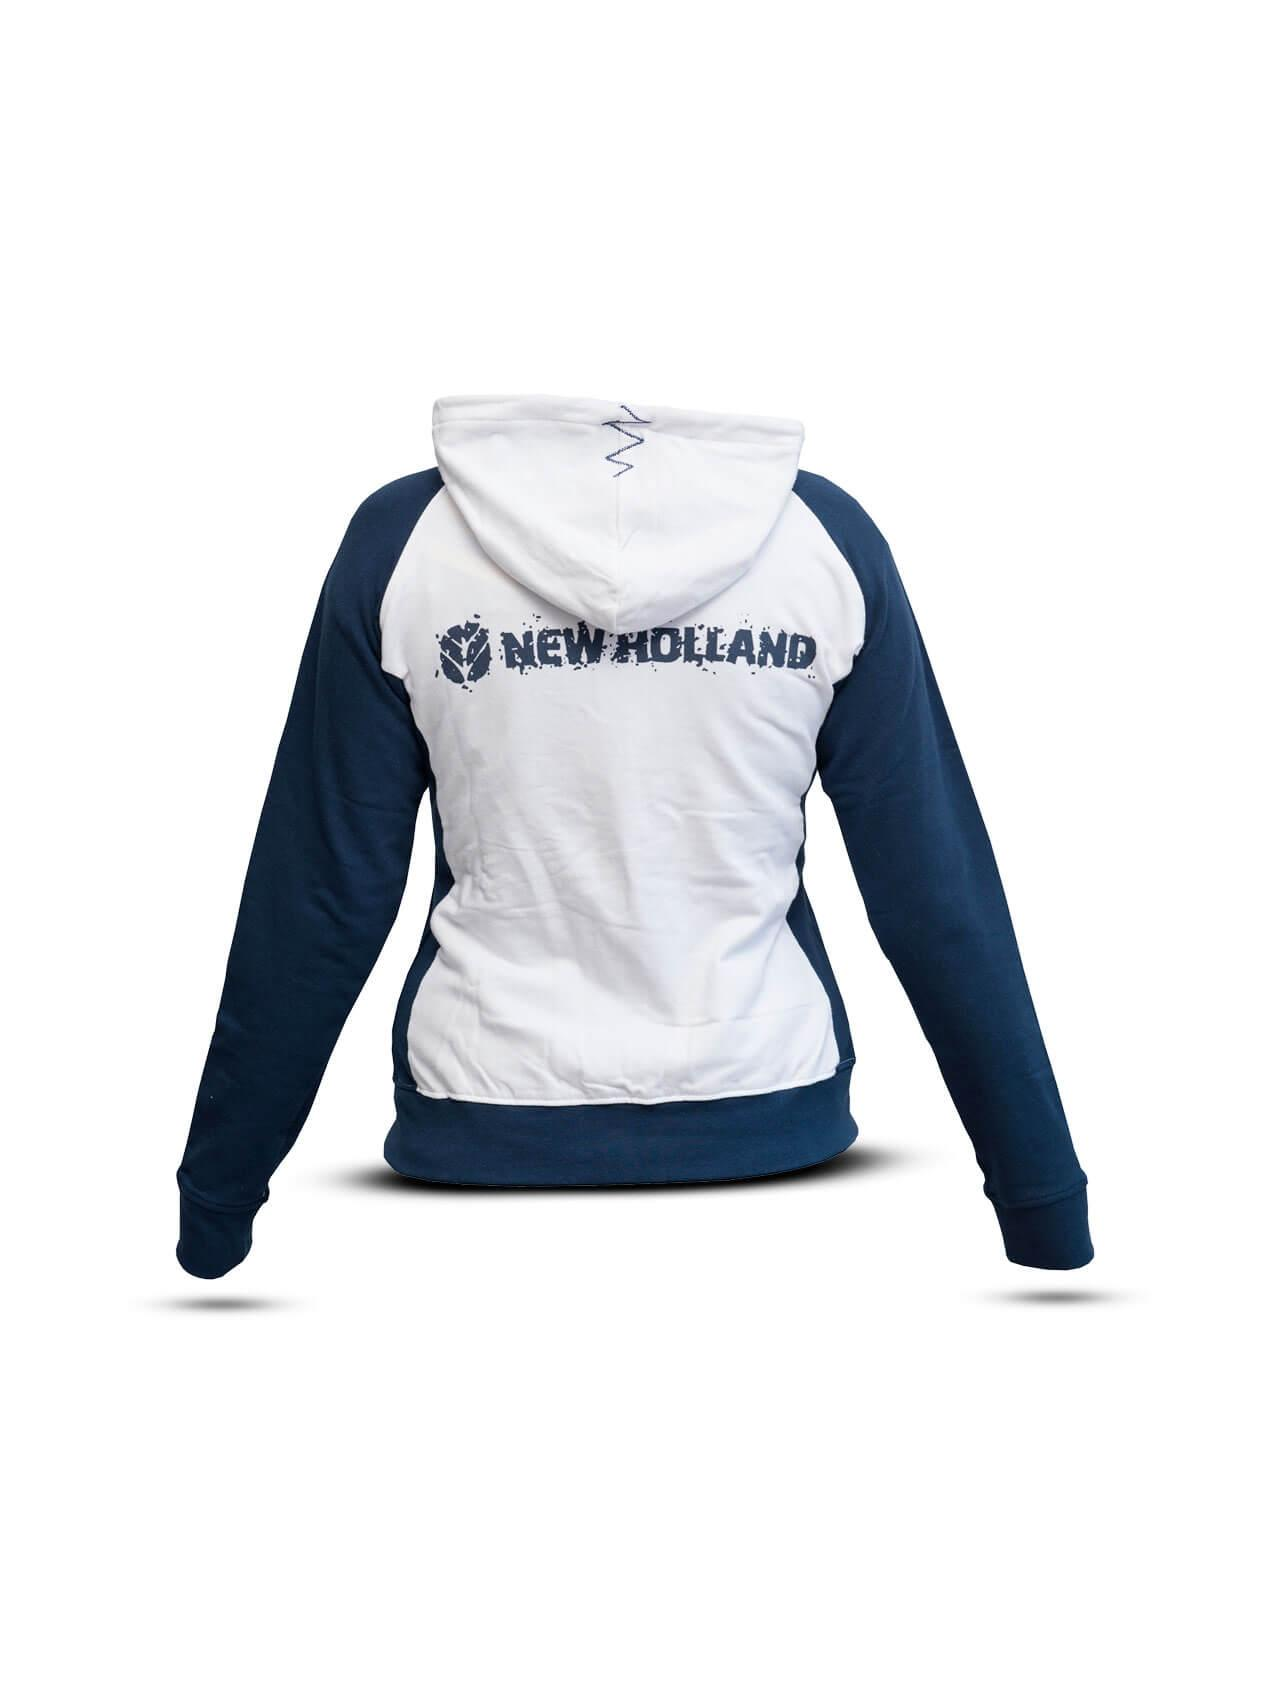 0002592 sweatshirt woman whiteblue 1